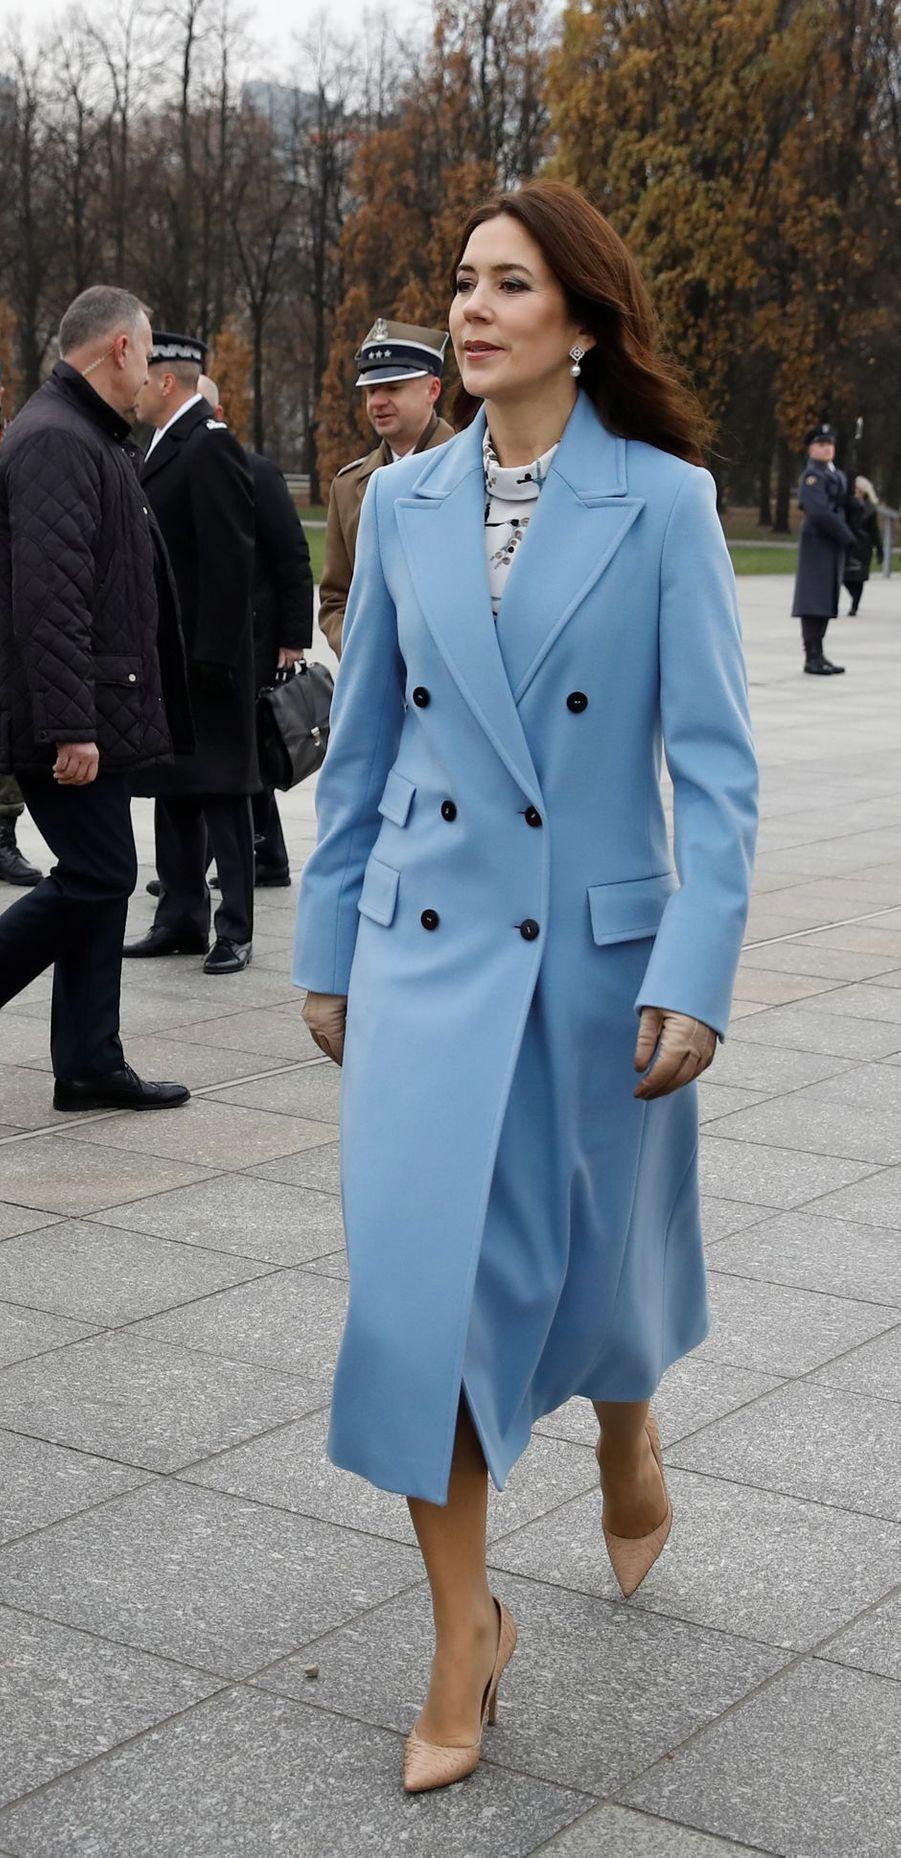 La princesse Mary de Danemark, en bleu ciel, à Varsovie le 25 novembre 2019